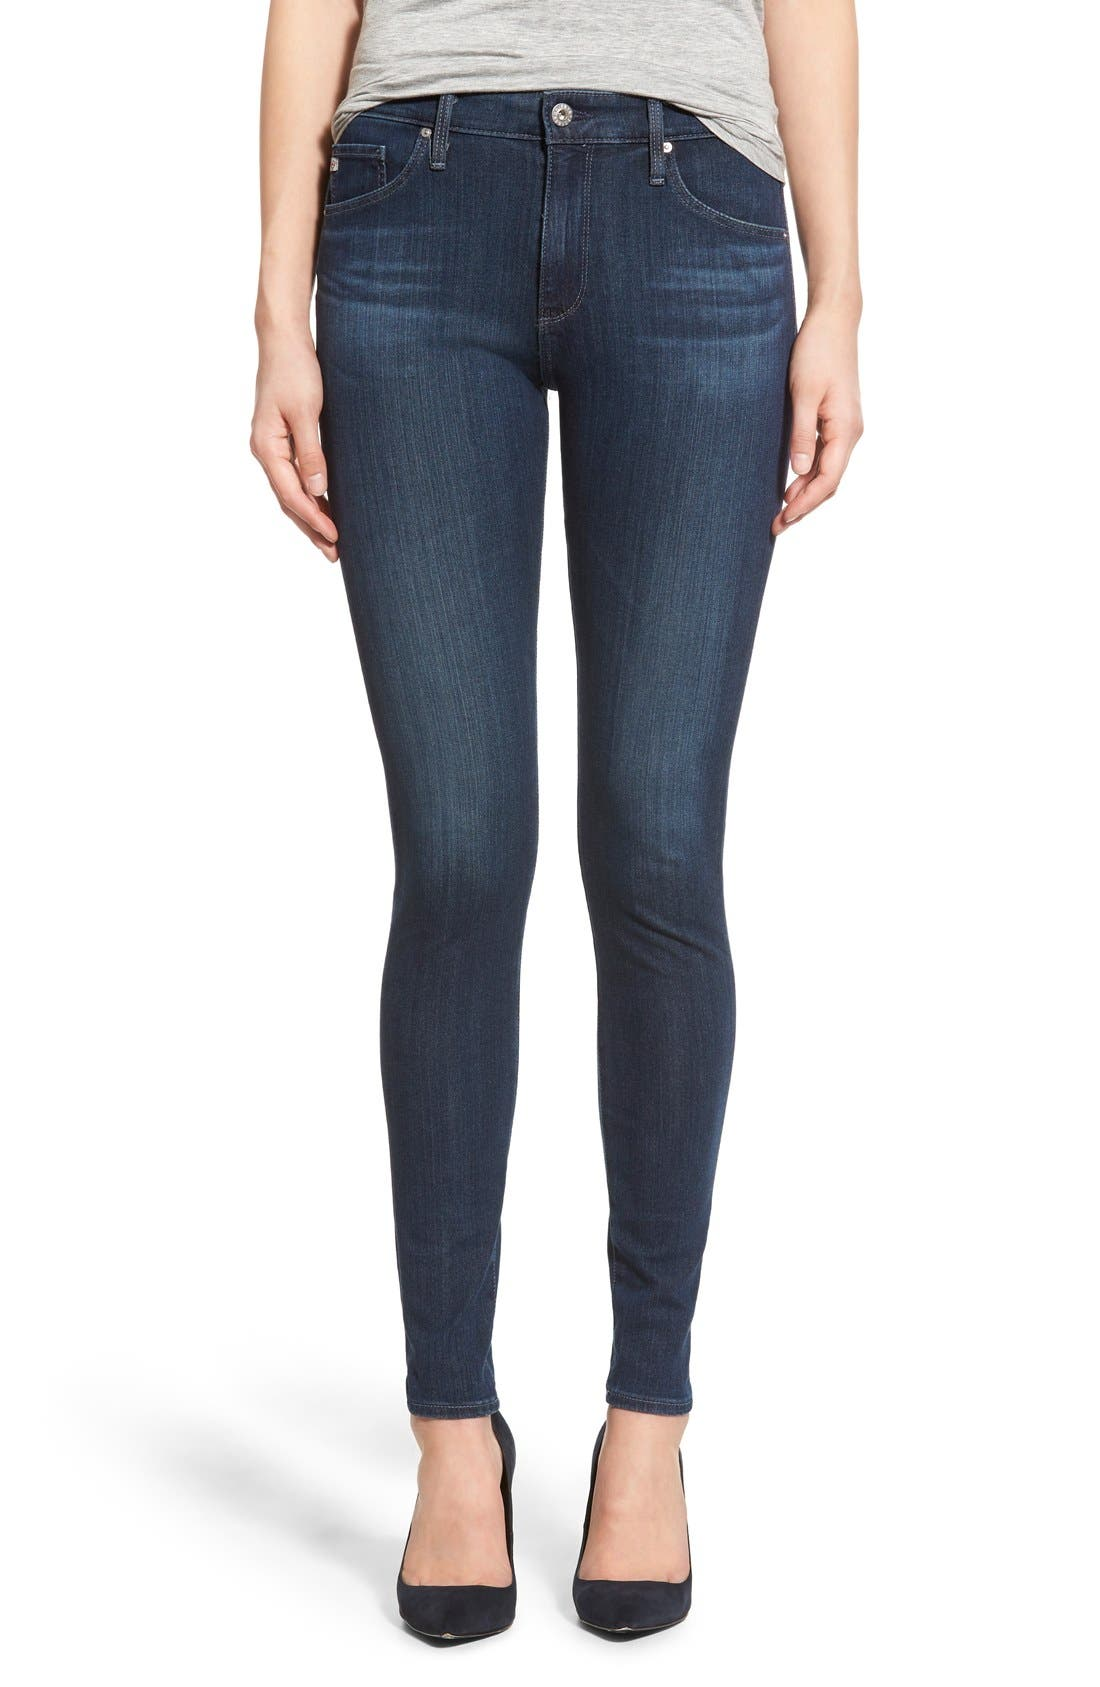 AG 'The Farrah' High Rise Skinny Jeans, Main, color, 402